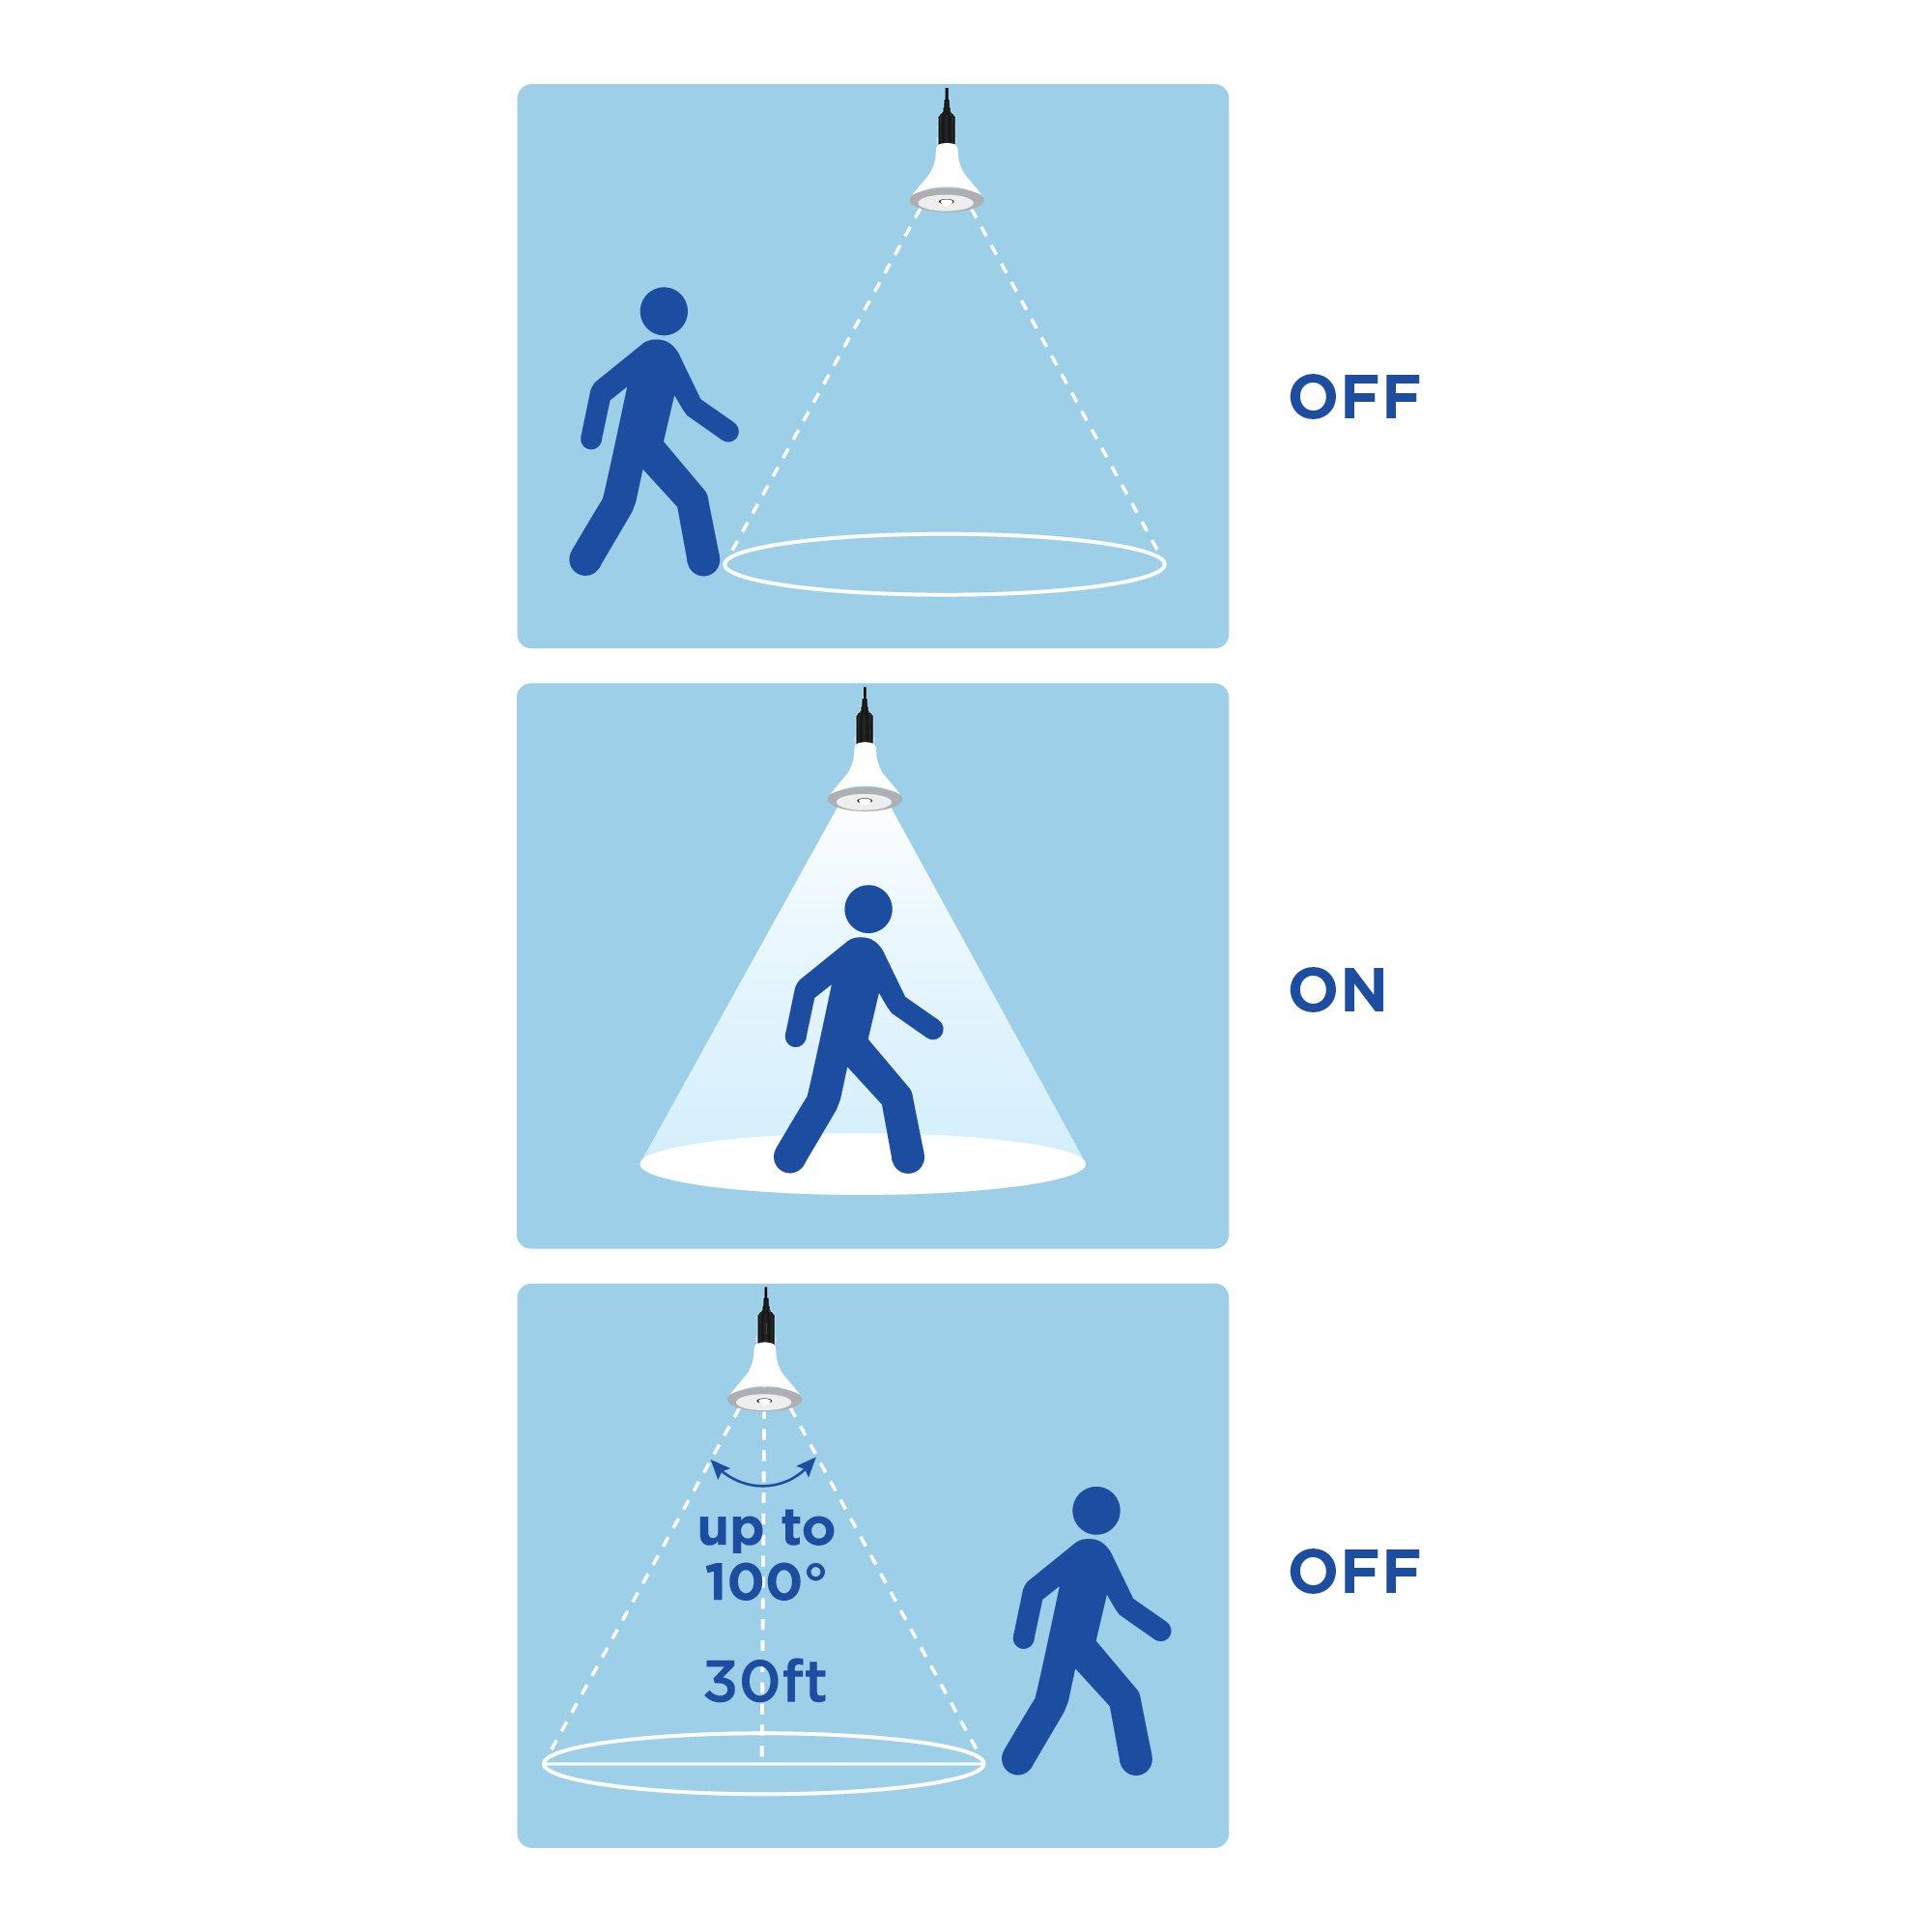 Sengled LED Flood Light with Motion Sensor & Daylight Sensor, Smart LED Light Bulb PAR38, Dusk to Dawn Bulb, Waterproof 3000K for Outdoor Use, 2 Pack by Sengled (Image #3)